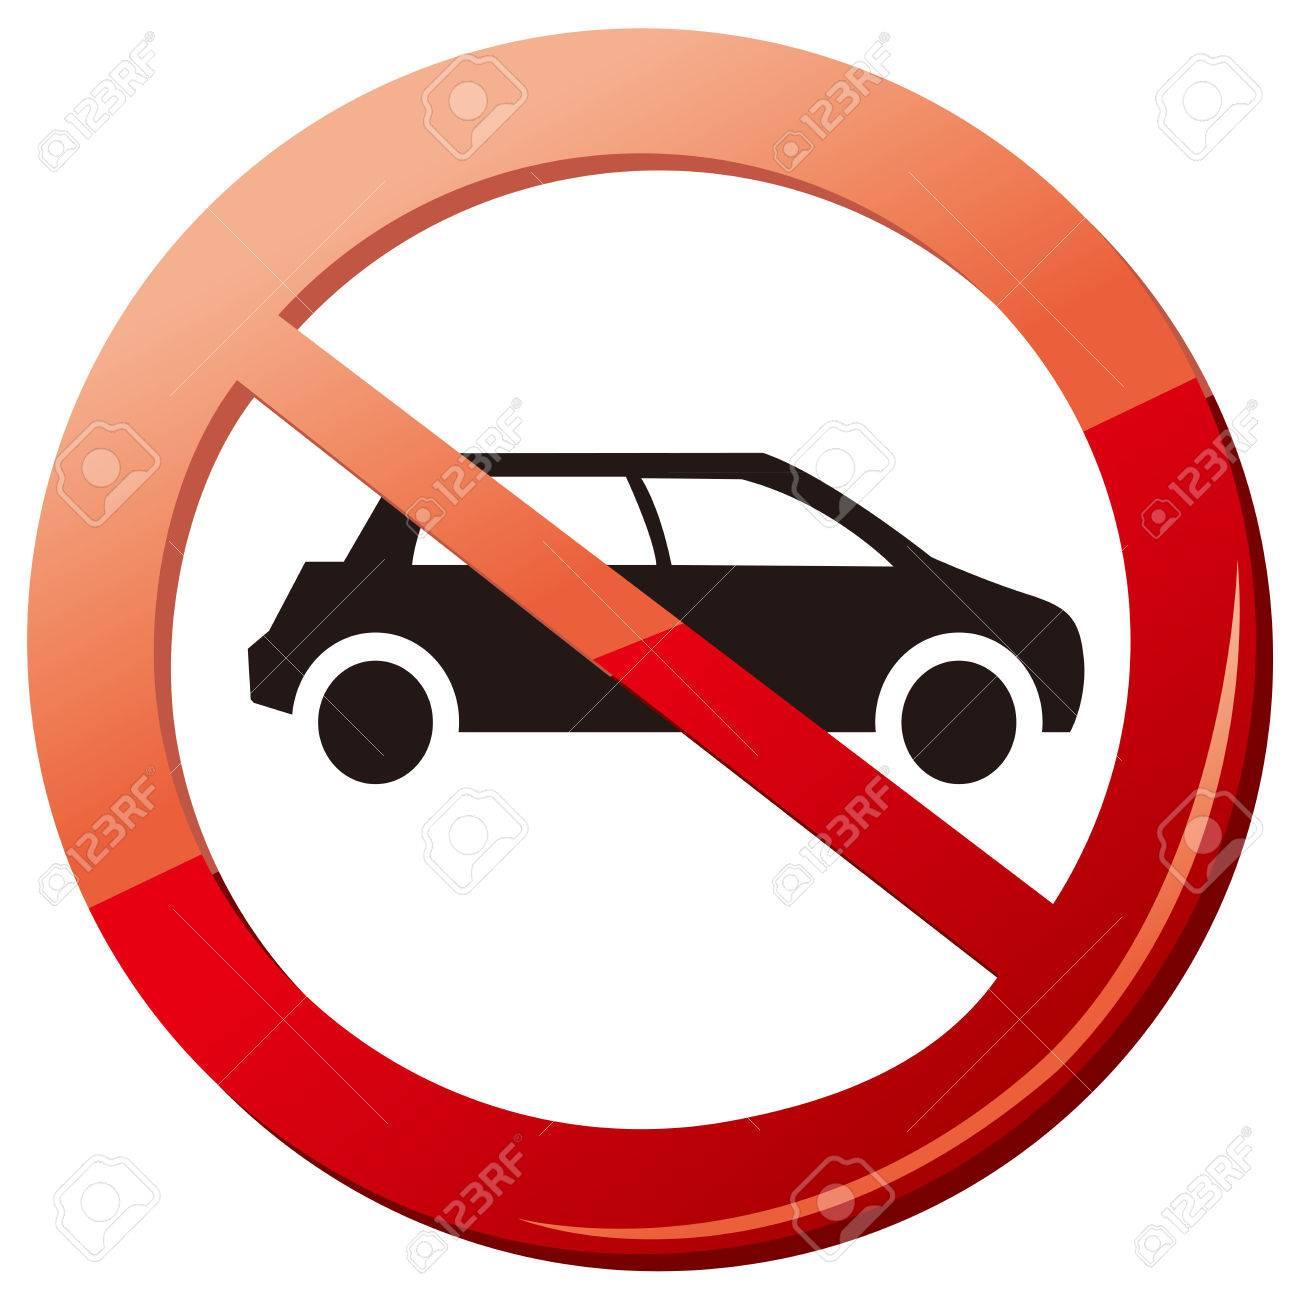 1,437 No Car Parking Stock Vector Illustration And Royalty Free No ...